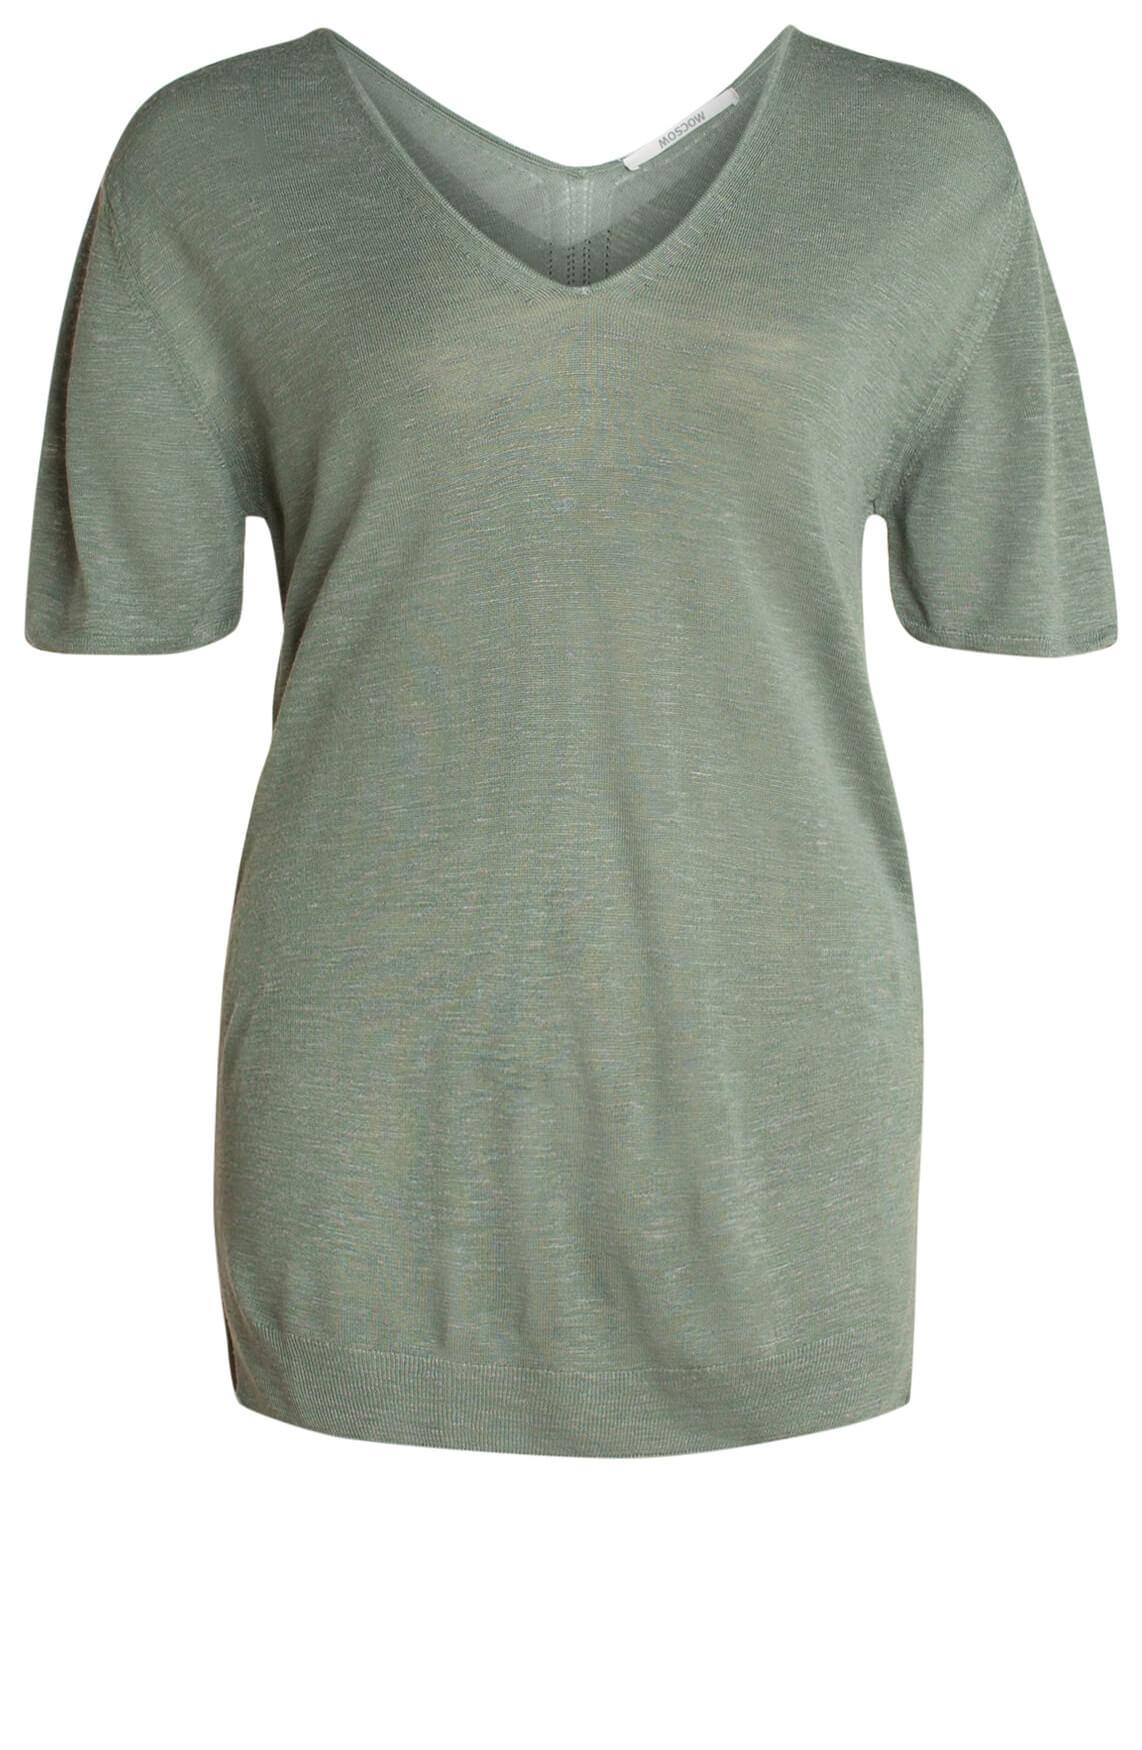 Moscow Dames Shirt met dessin groen